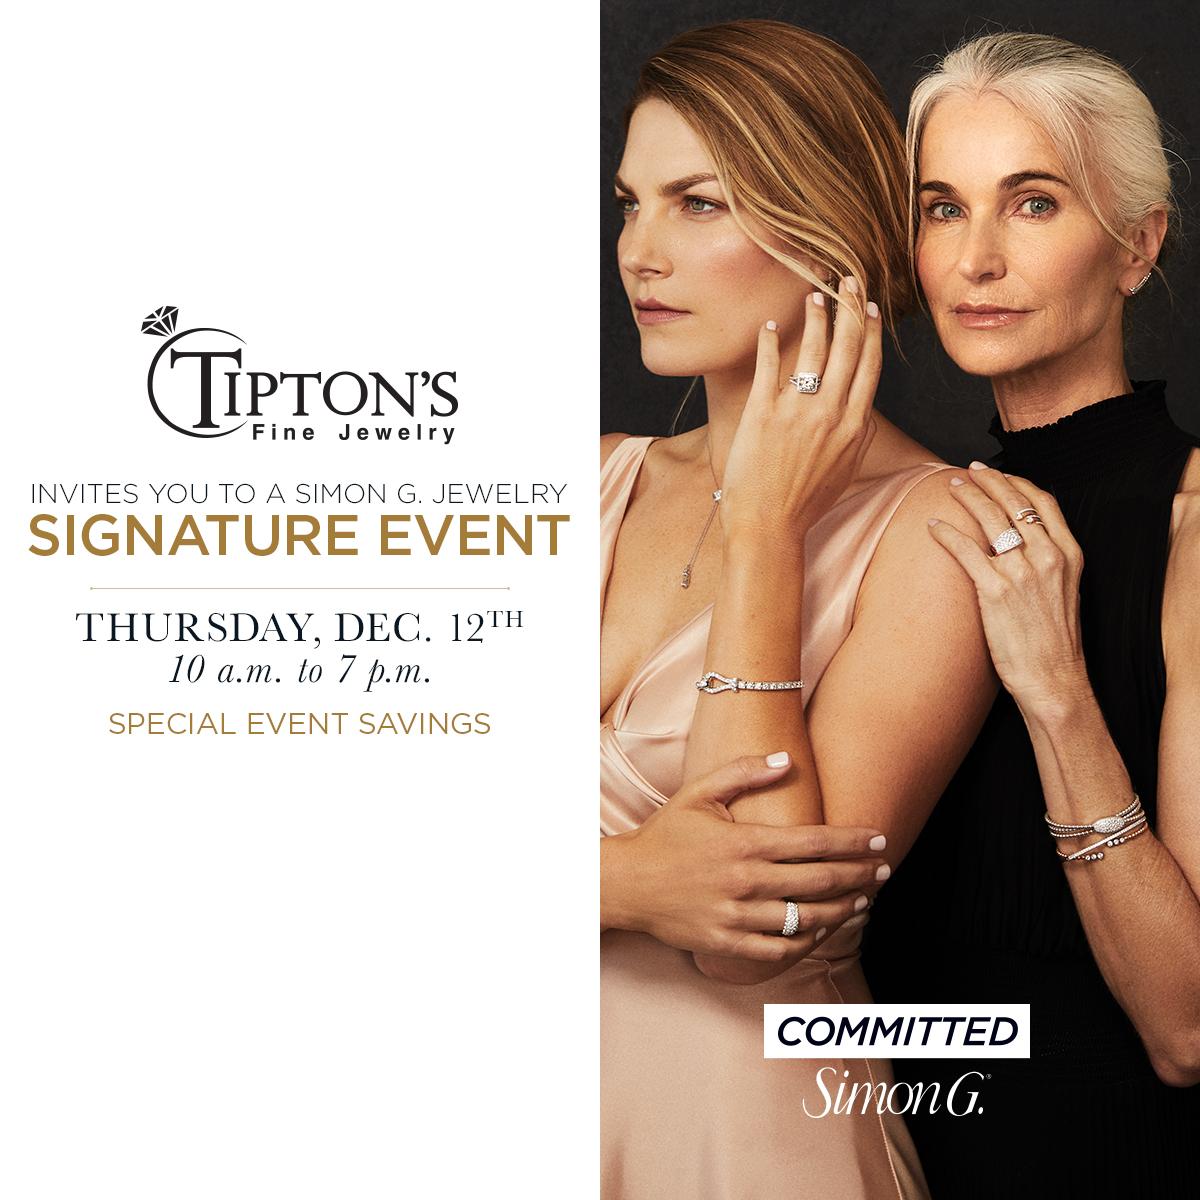 Simon G. Event at Tipton's Fine Jewelry